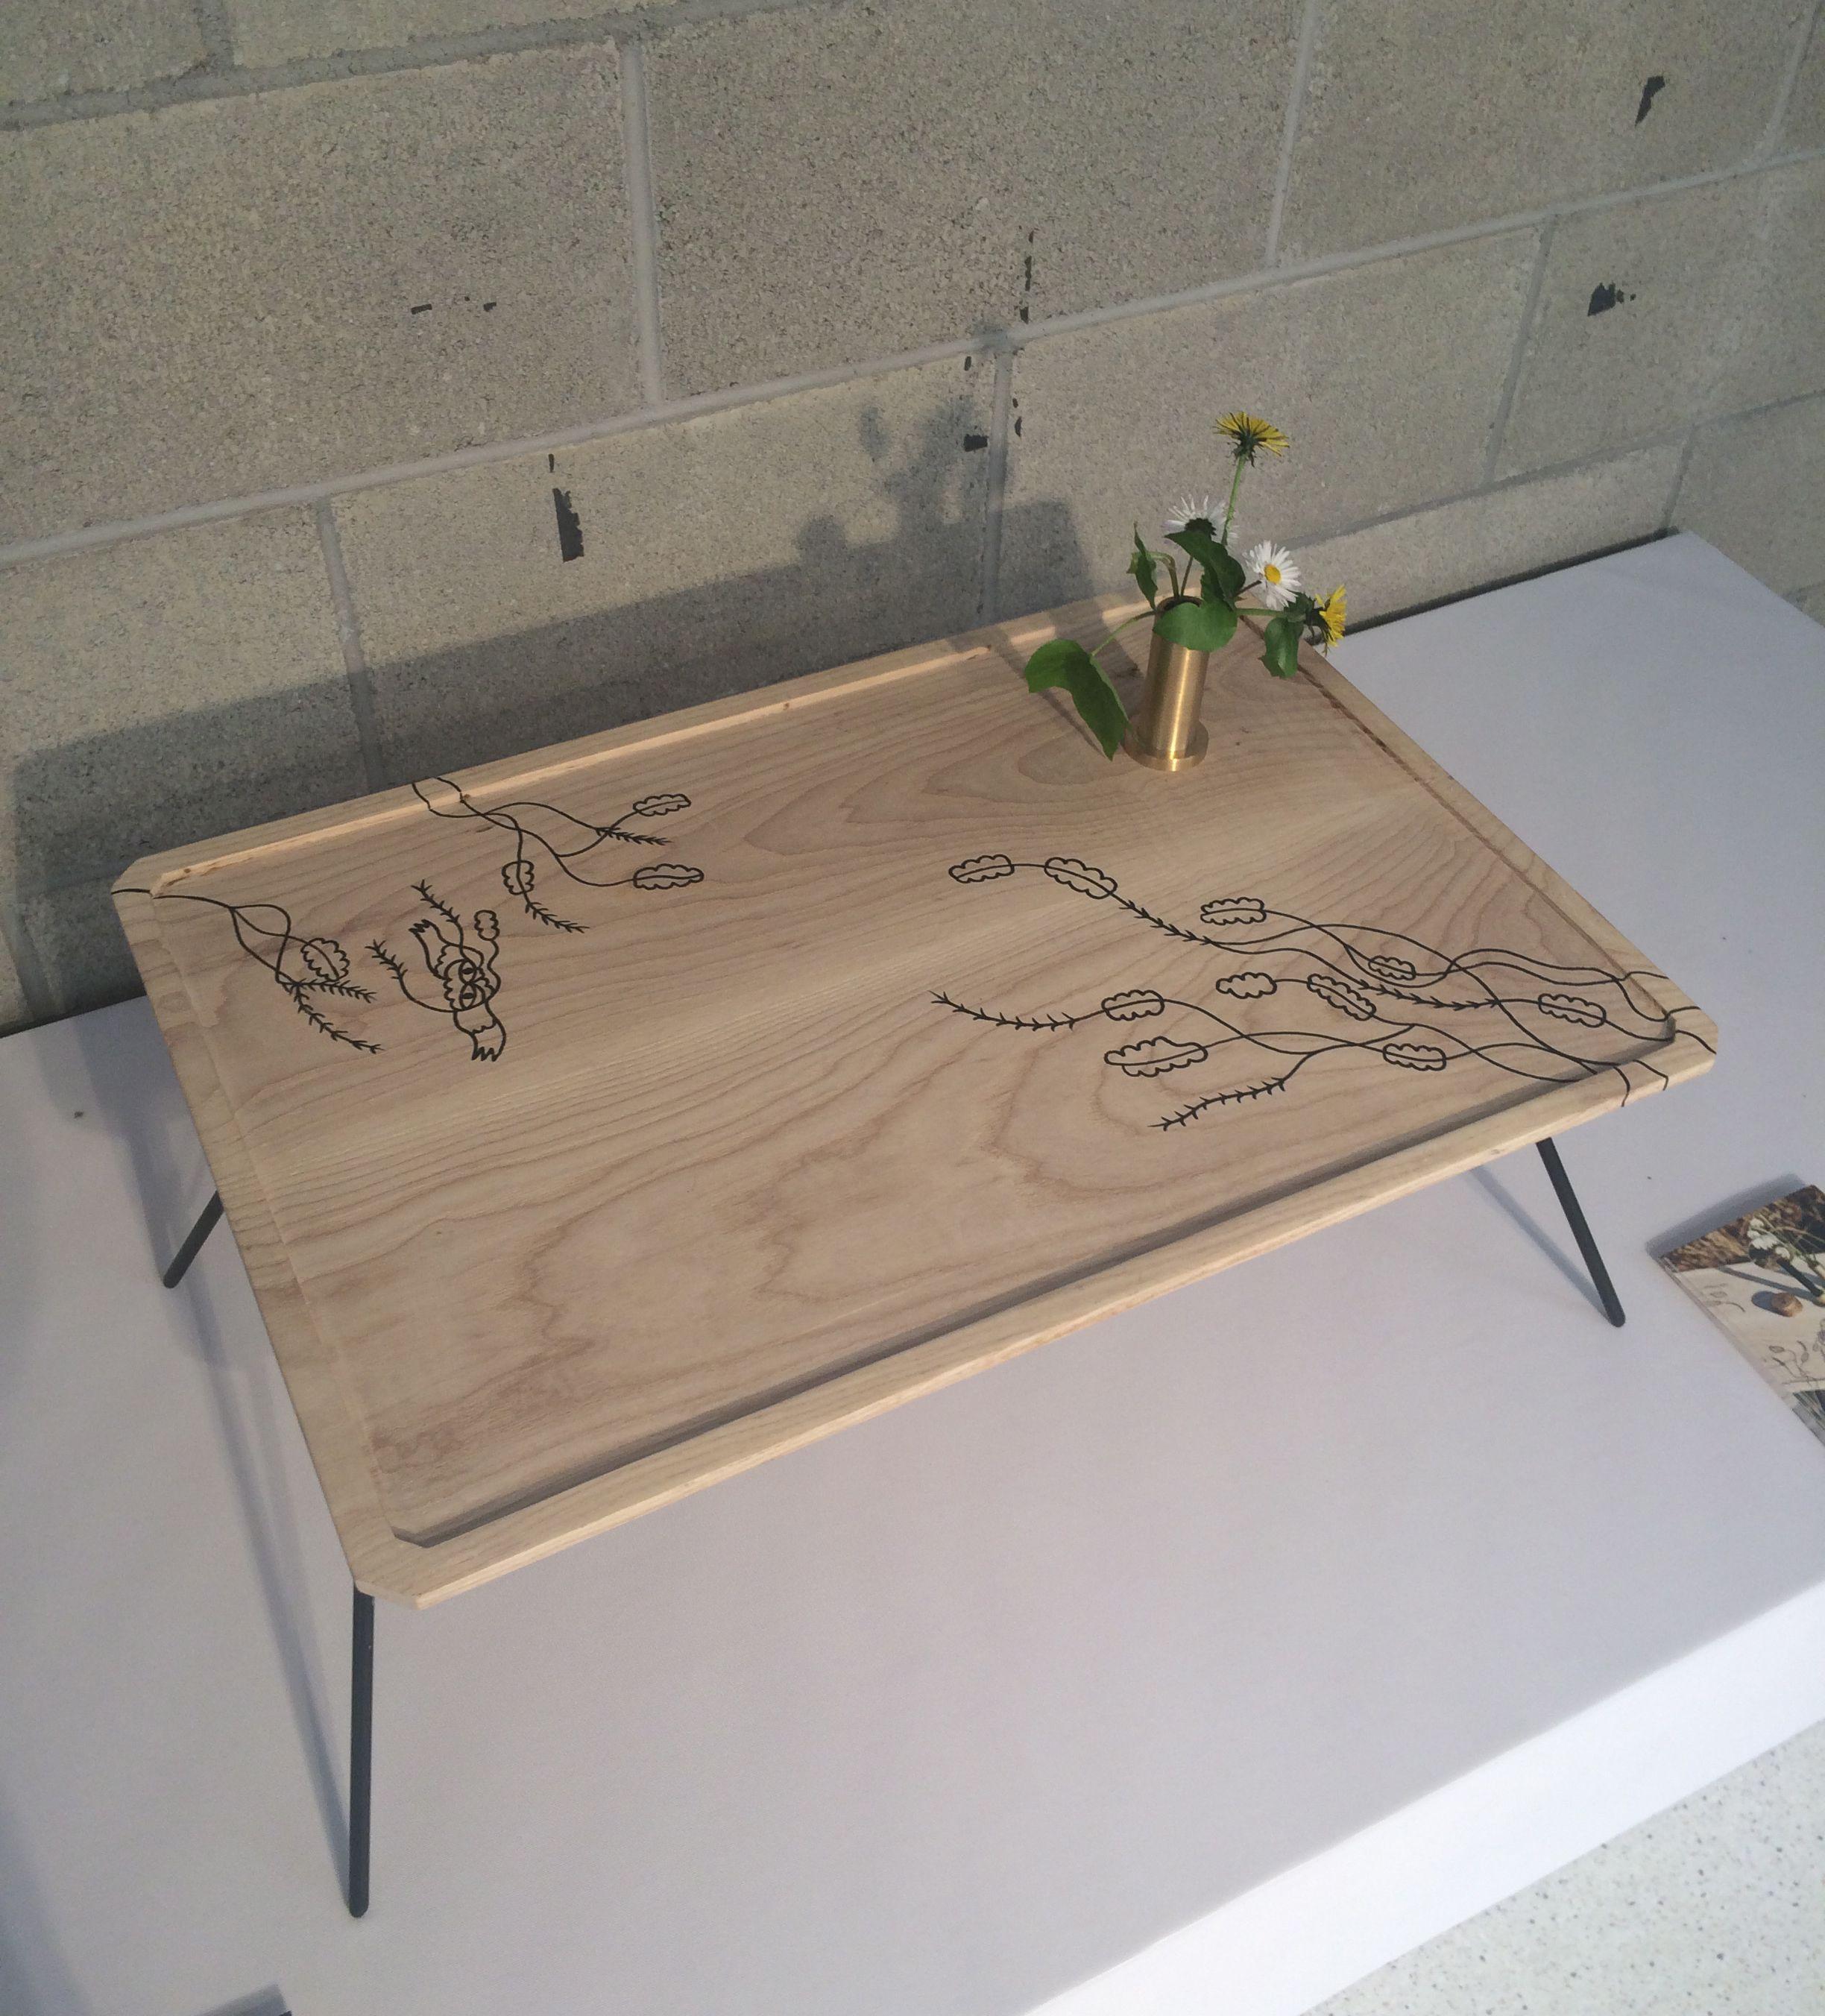 Beistelltisch, Tablett Aus Holz, Handbemalt. Side Table, Wooden Tray, Hand  Painted Amazing Pictures